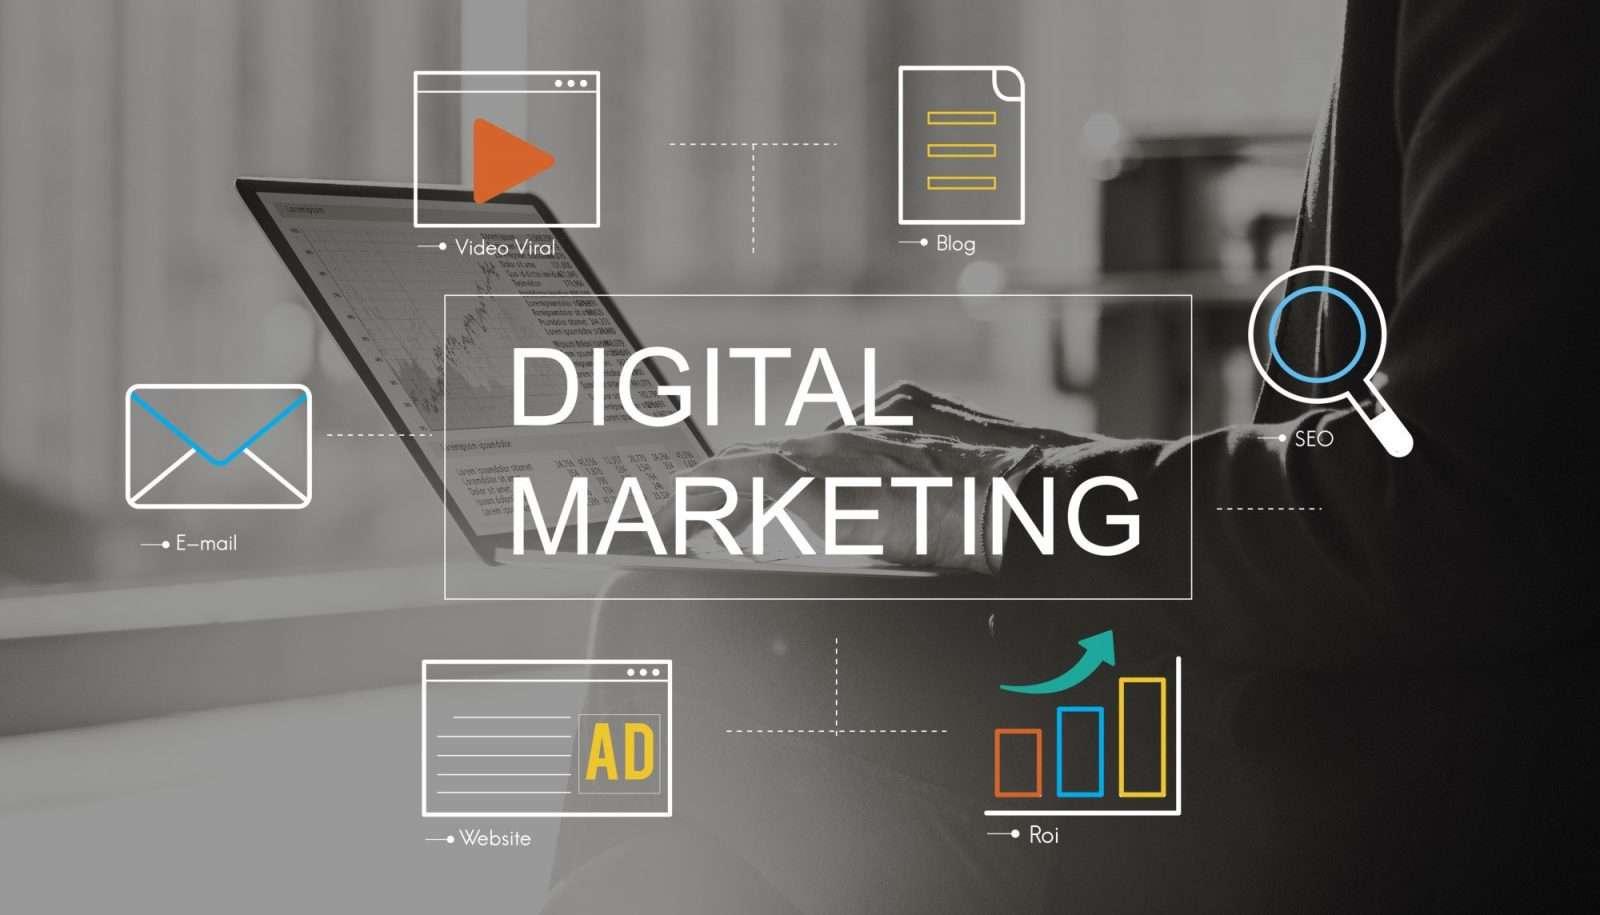 future of digital marketing post COVID-19